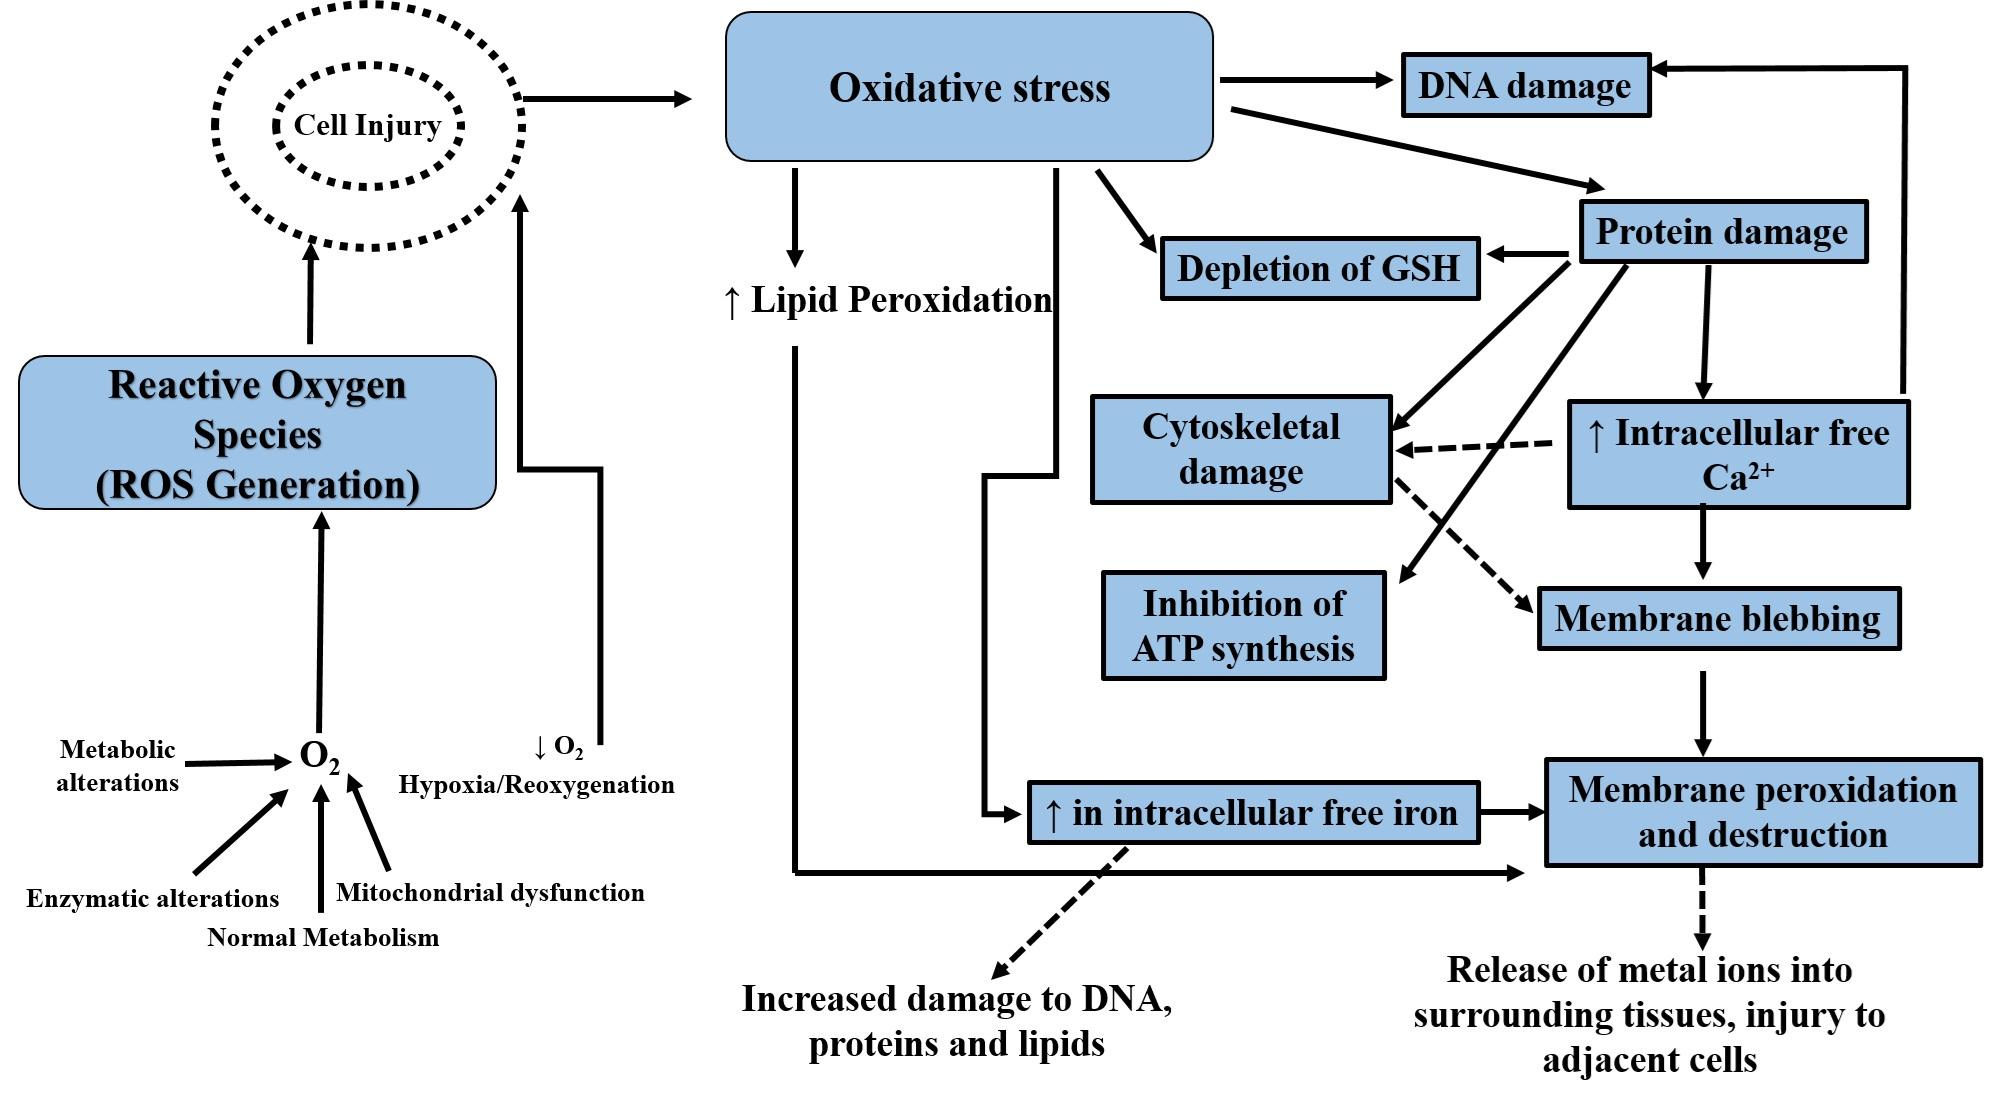 Mechanism of Oxidative cellular damage induced by pesticide